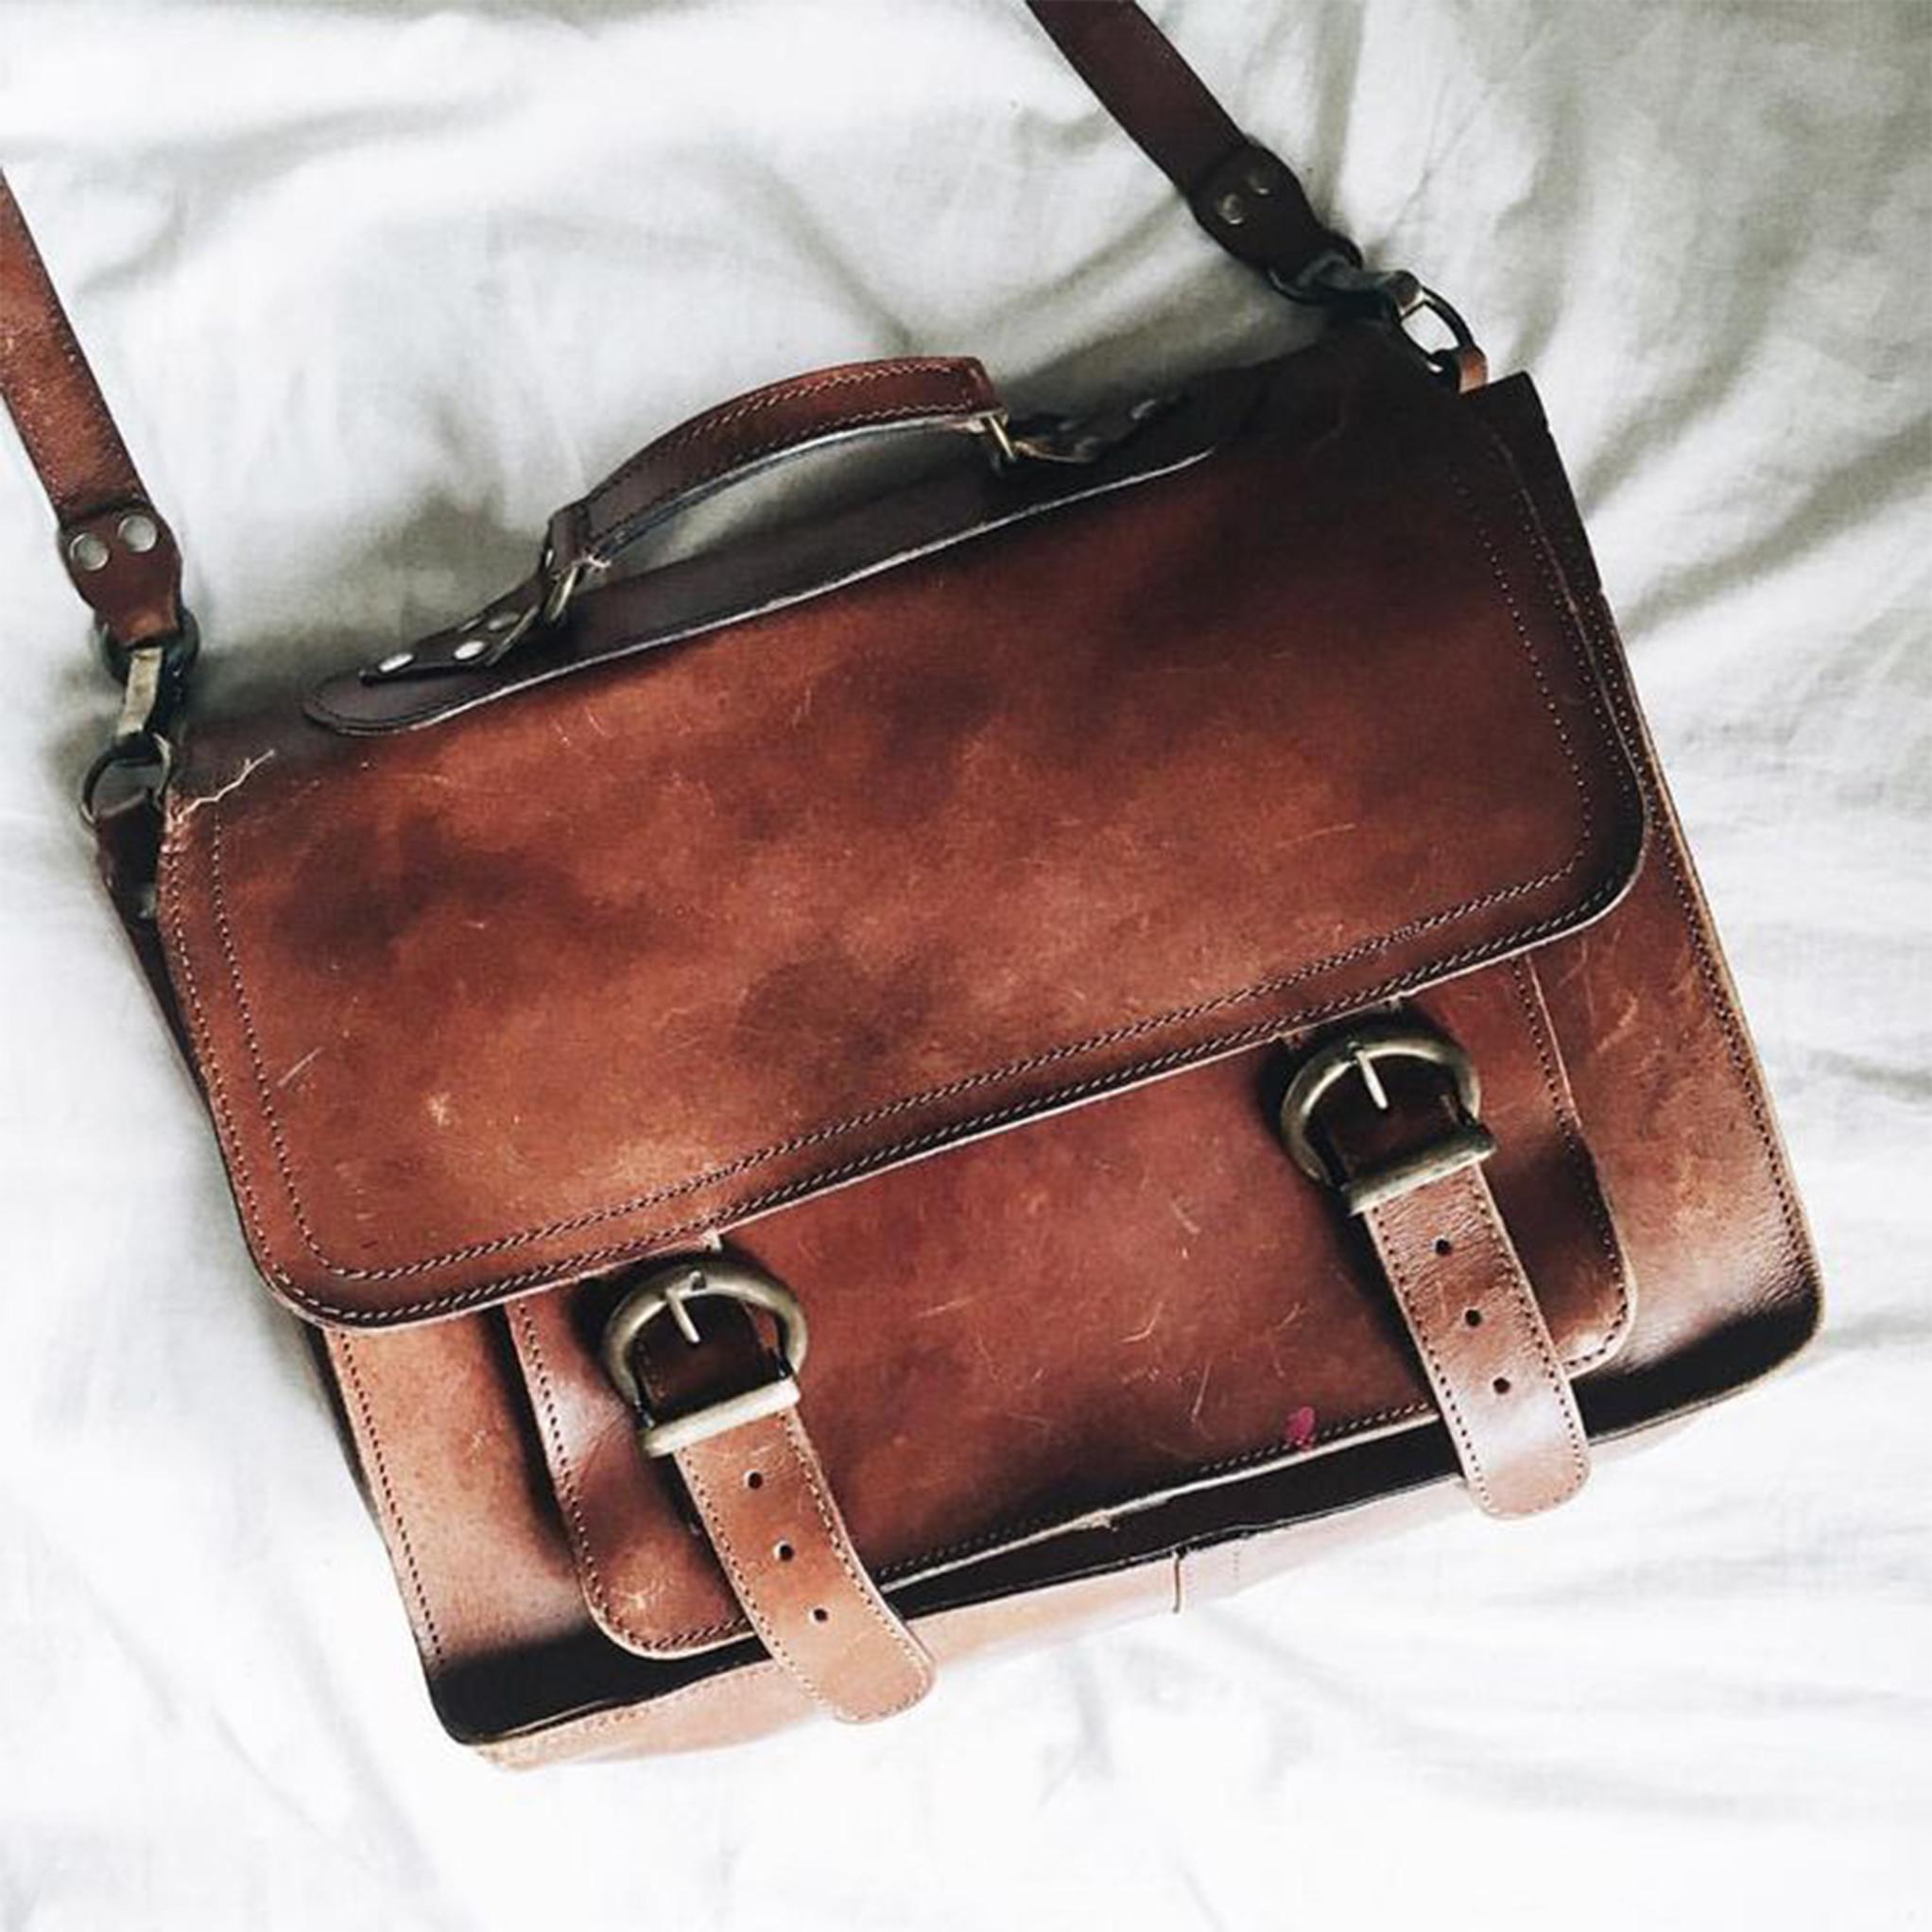 58878fc3dbdba88bc332b87873ccaf06-side-bags-spencer-reid-outfit-1